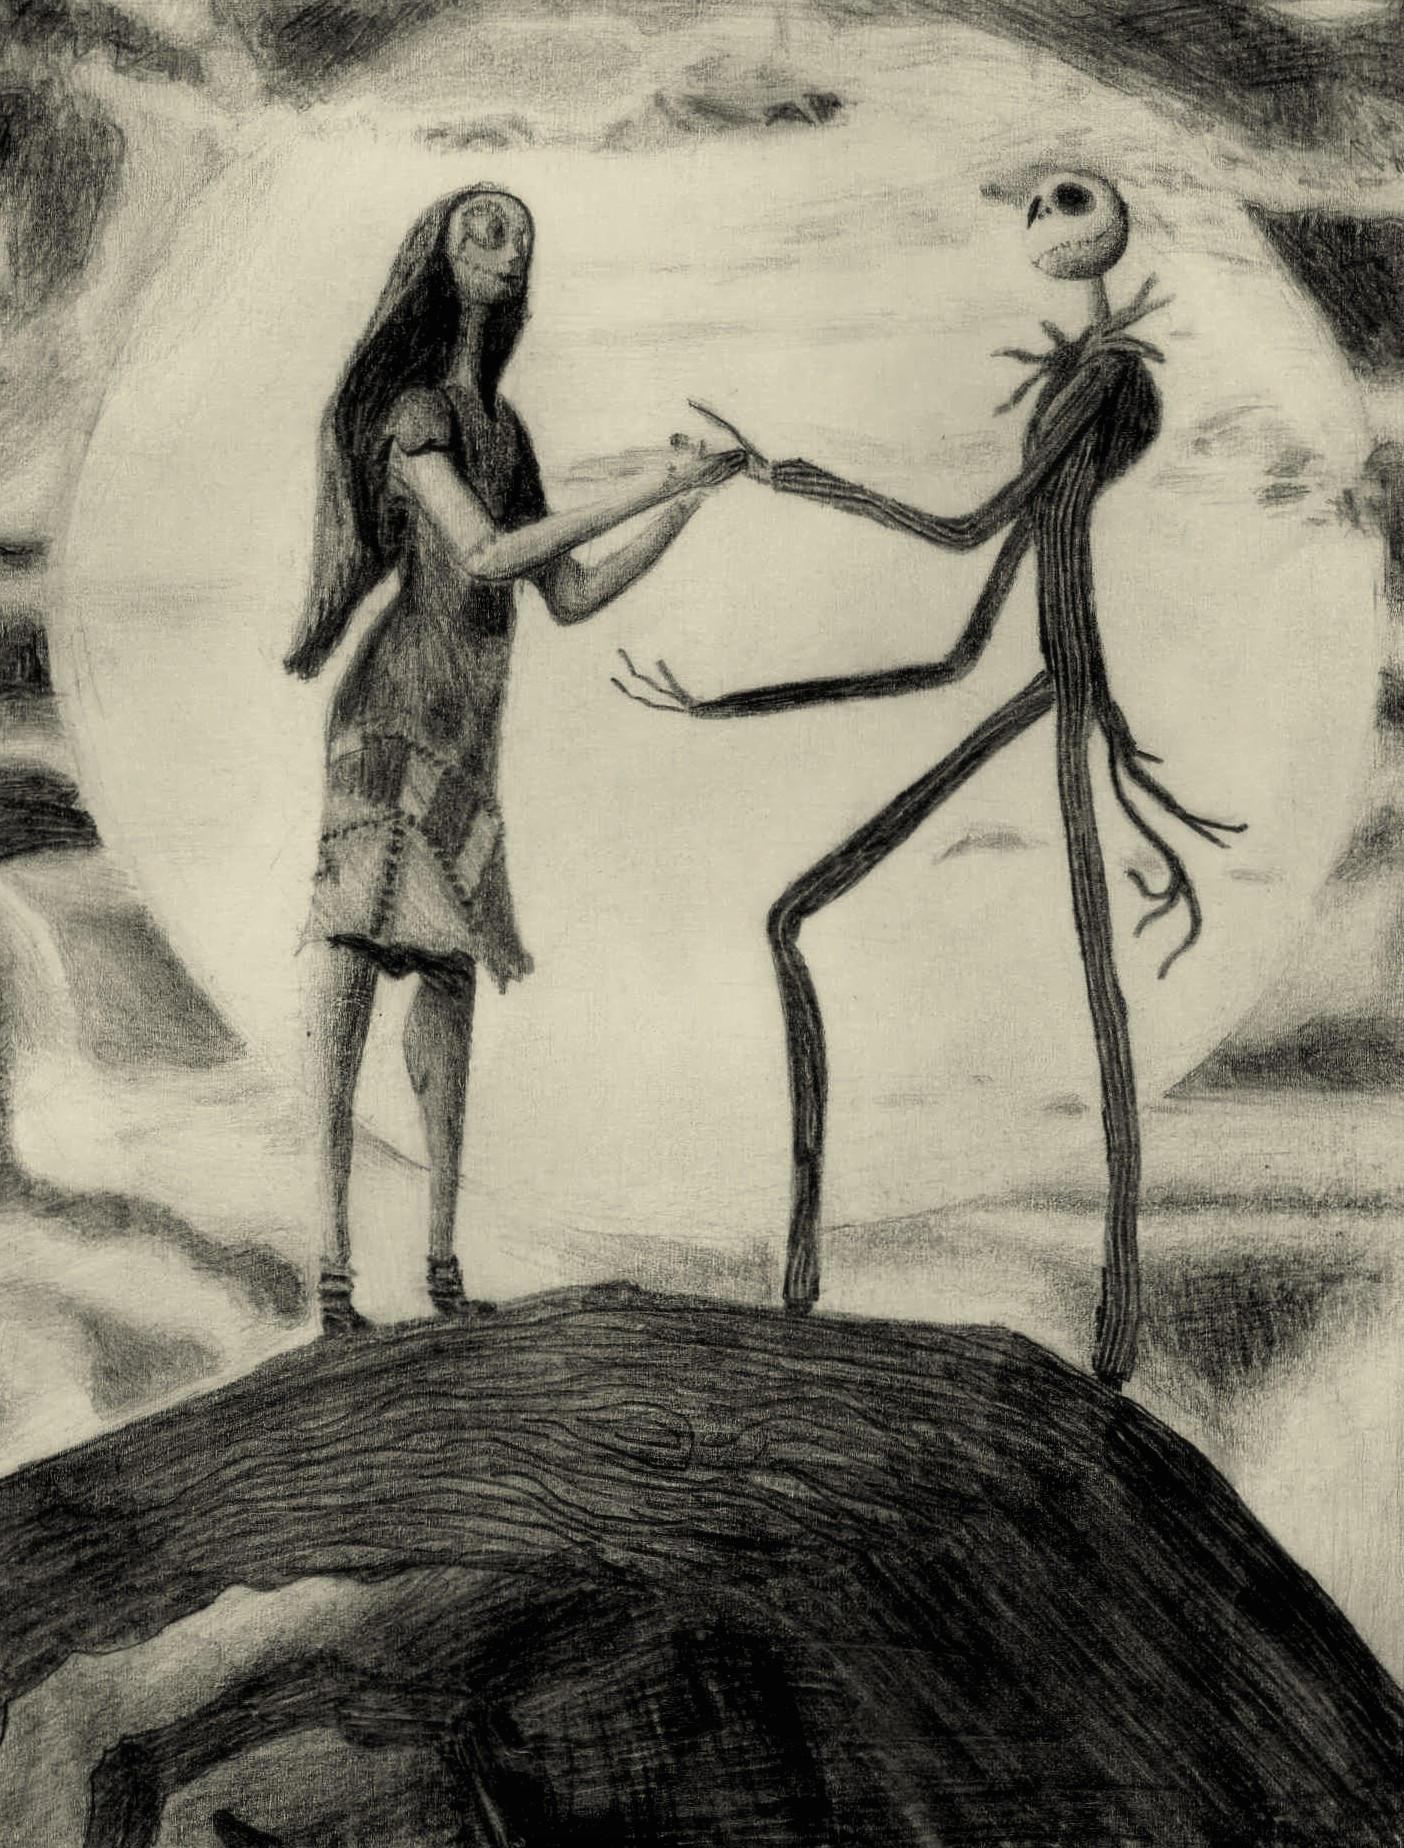 Jack and Sally by wattaip on DeviantArt